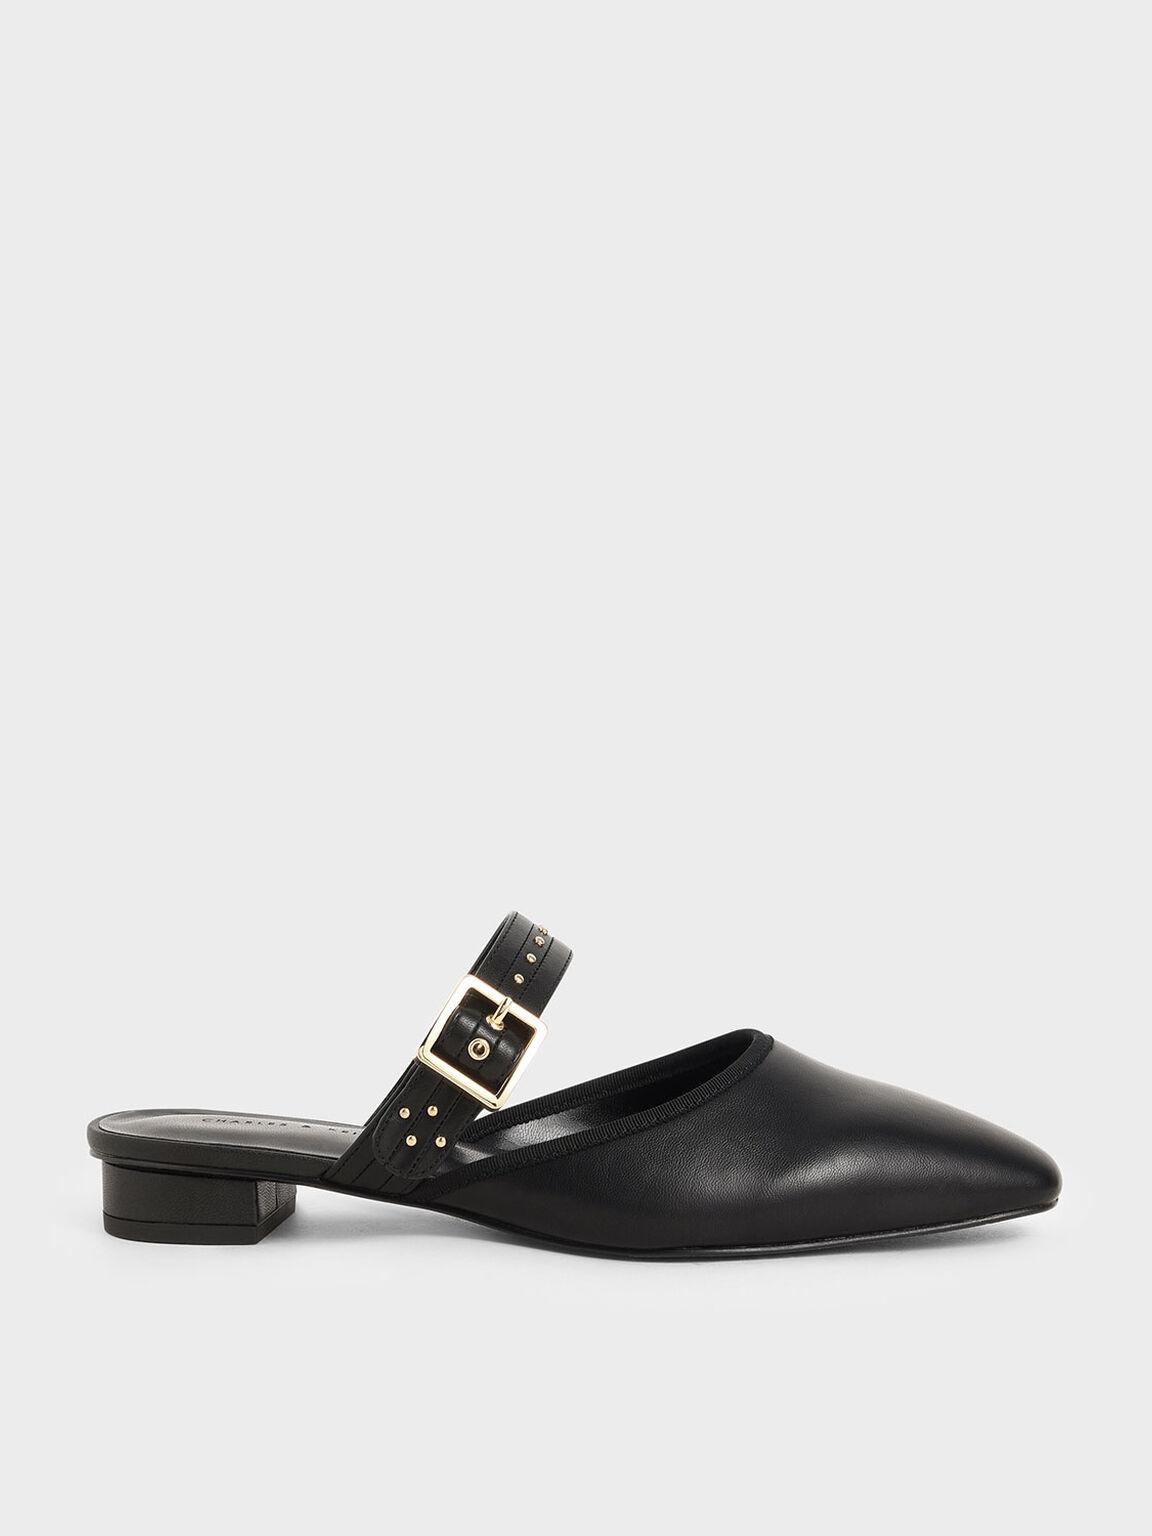 Studded Round Toe Mules, Black, hi-res